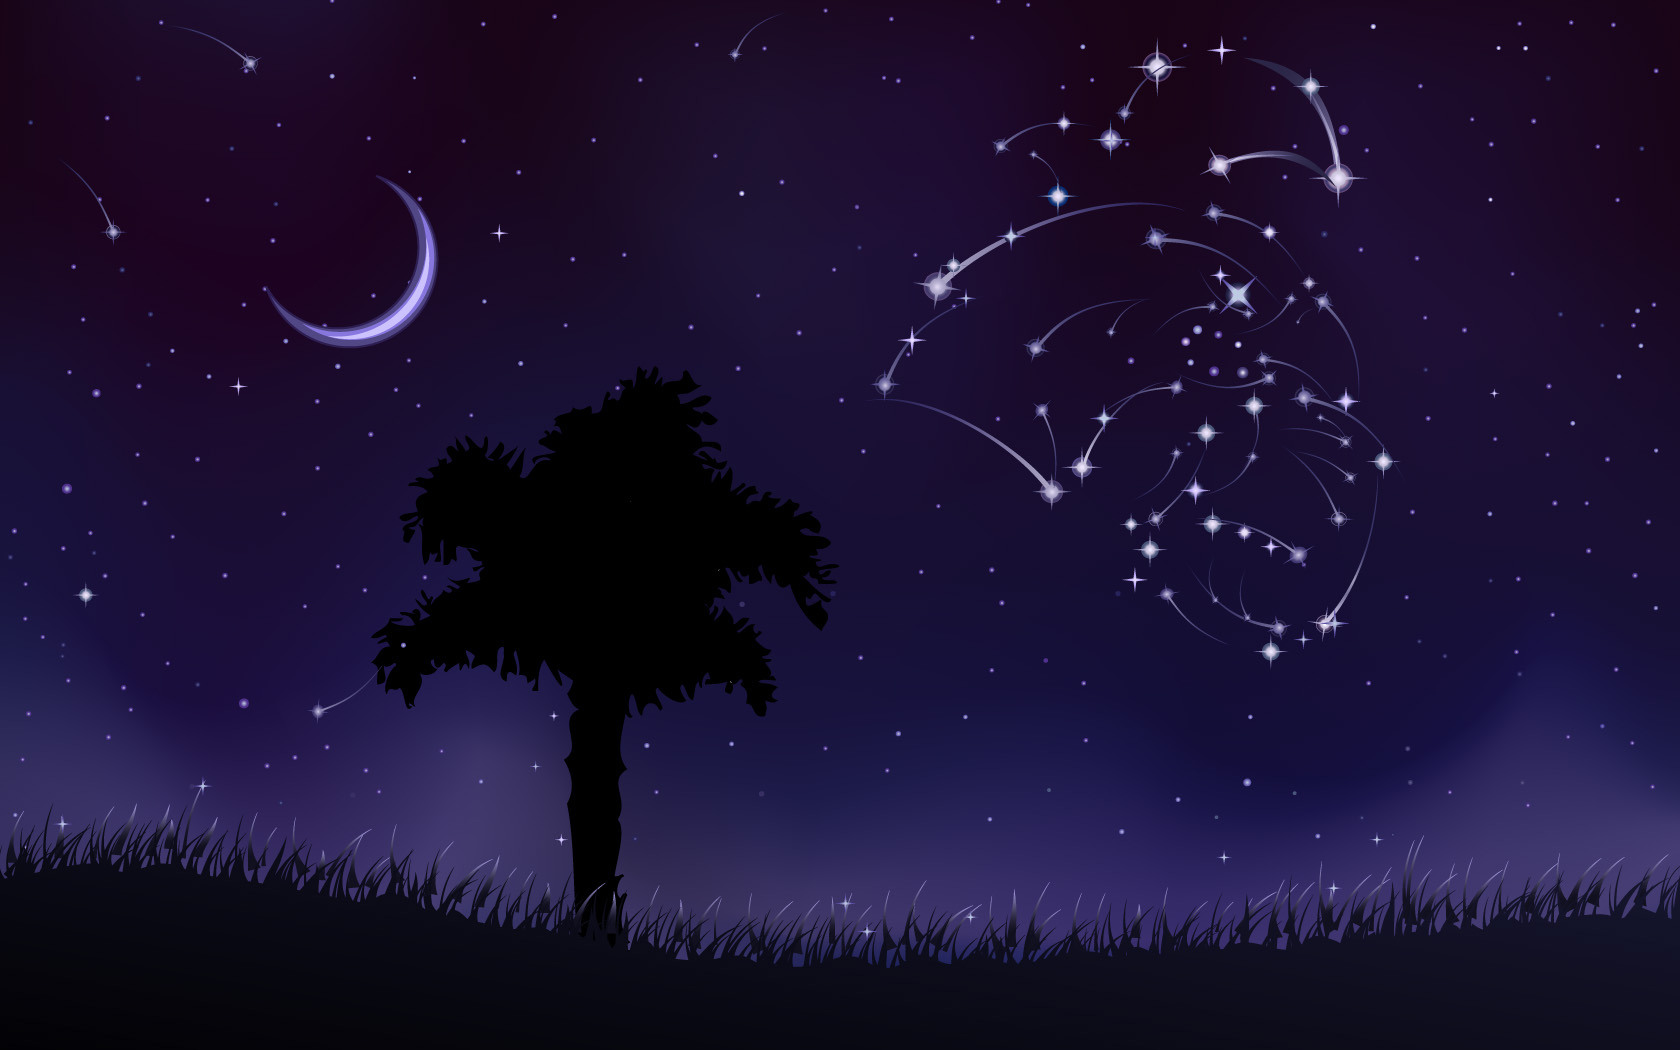 Constellations Background 1680x1050